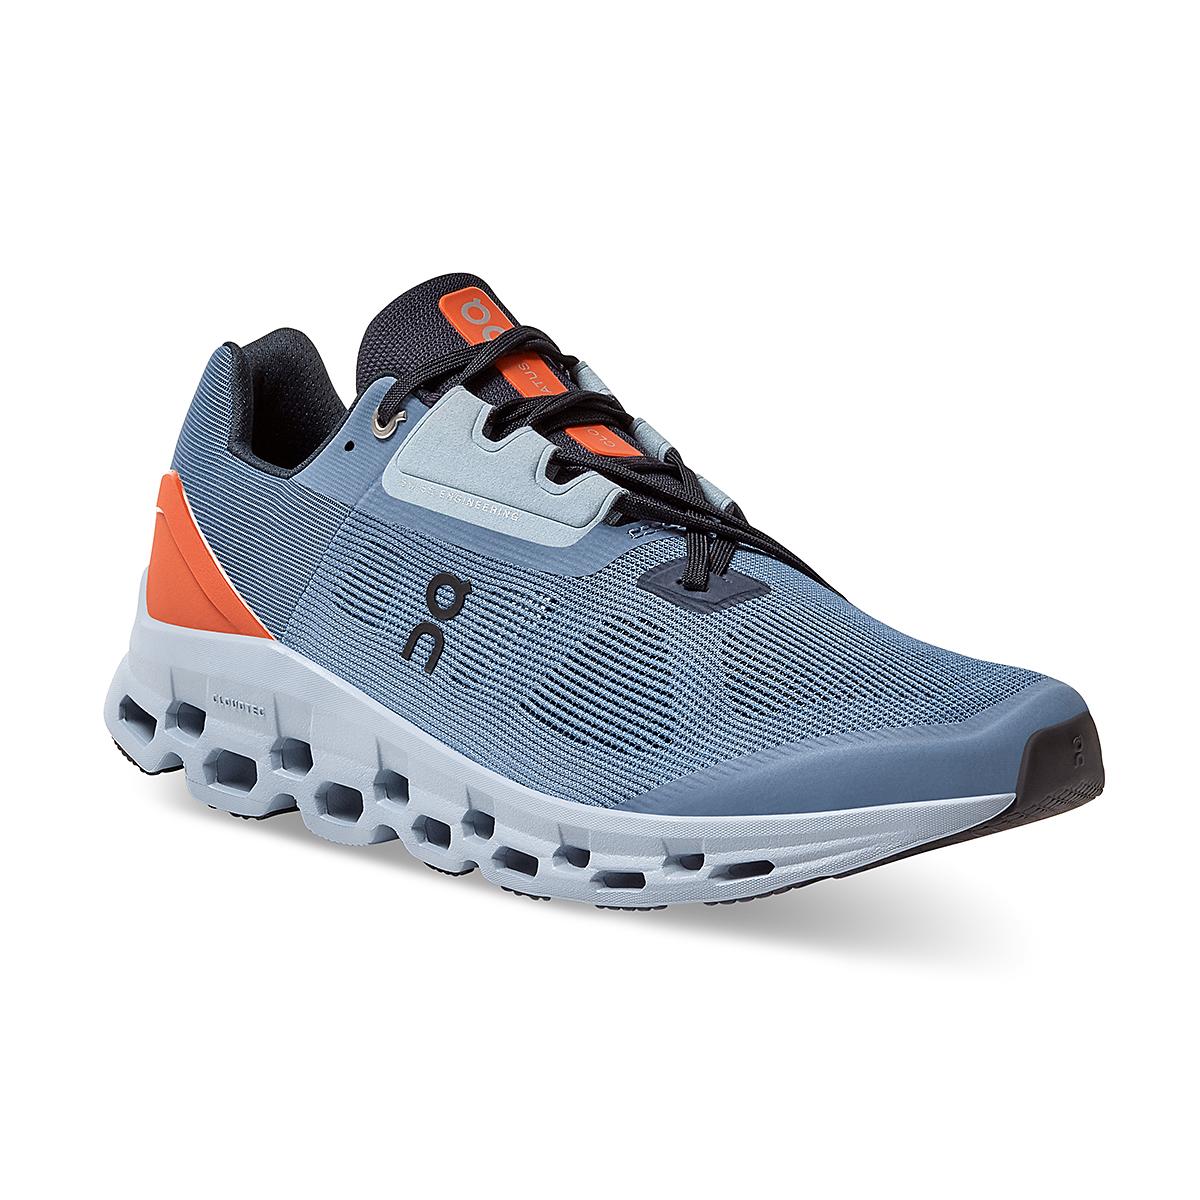 Men's On Cloudstratus 2.0 Running Shoe - Color: Lake/Flare - Size: 7 - Width: Regular, Lake/Flare, large, image 2